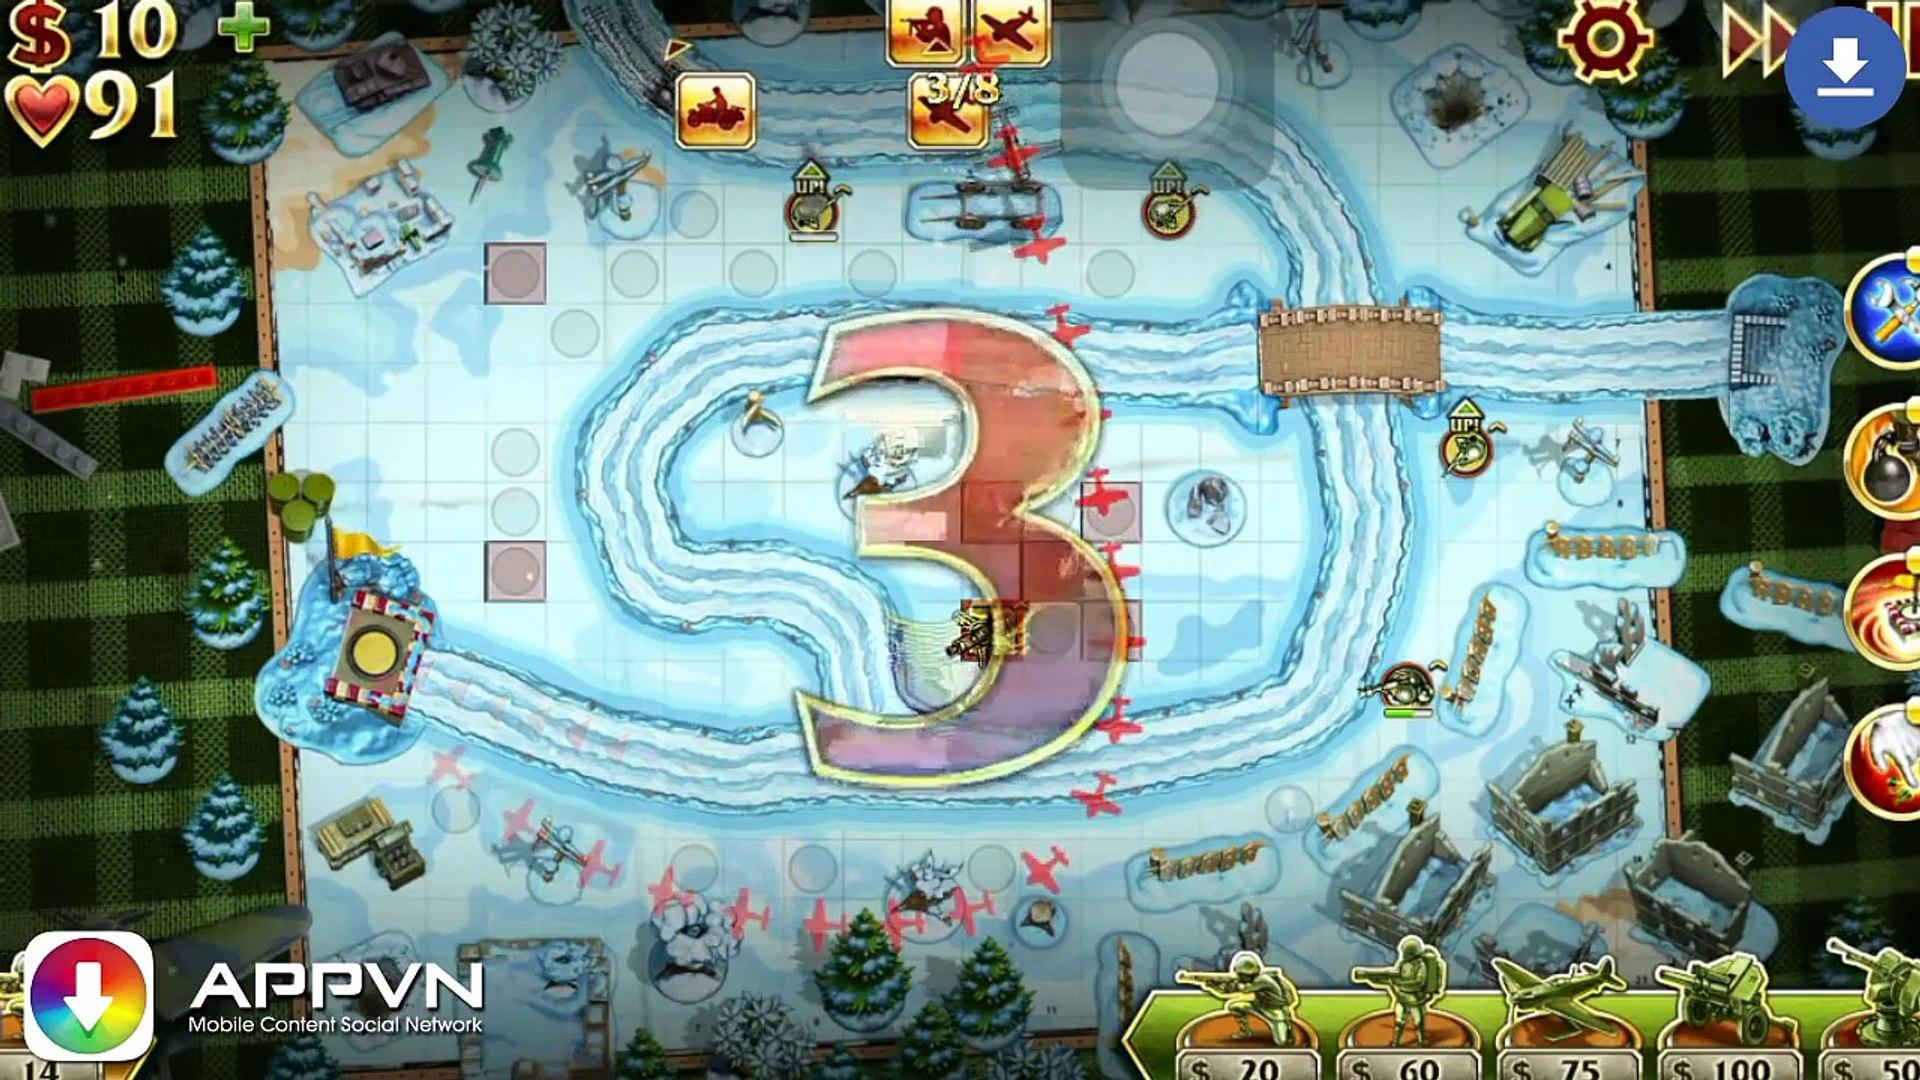 [Game IOS] Toy Defense 2 - Thủ thành chiến tranh thế giới - AppStore.Vn